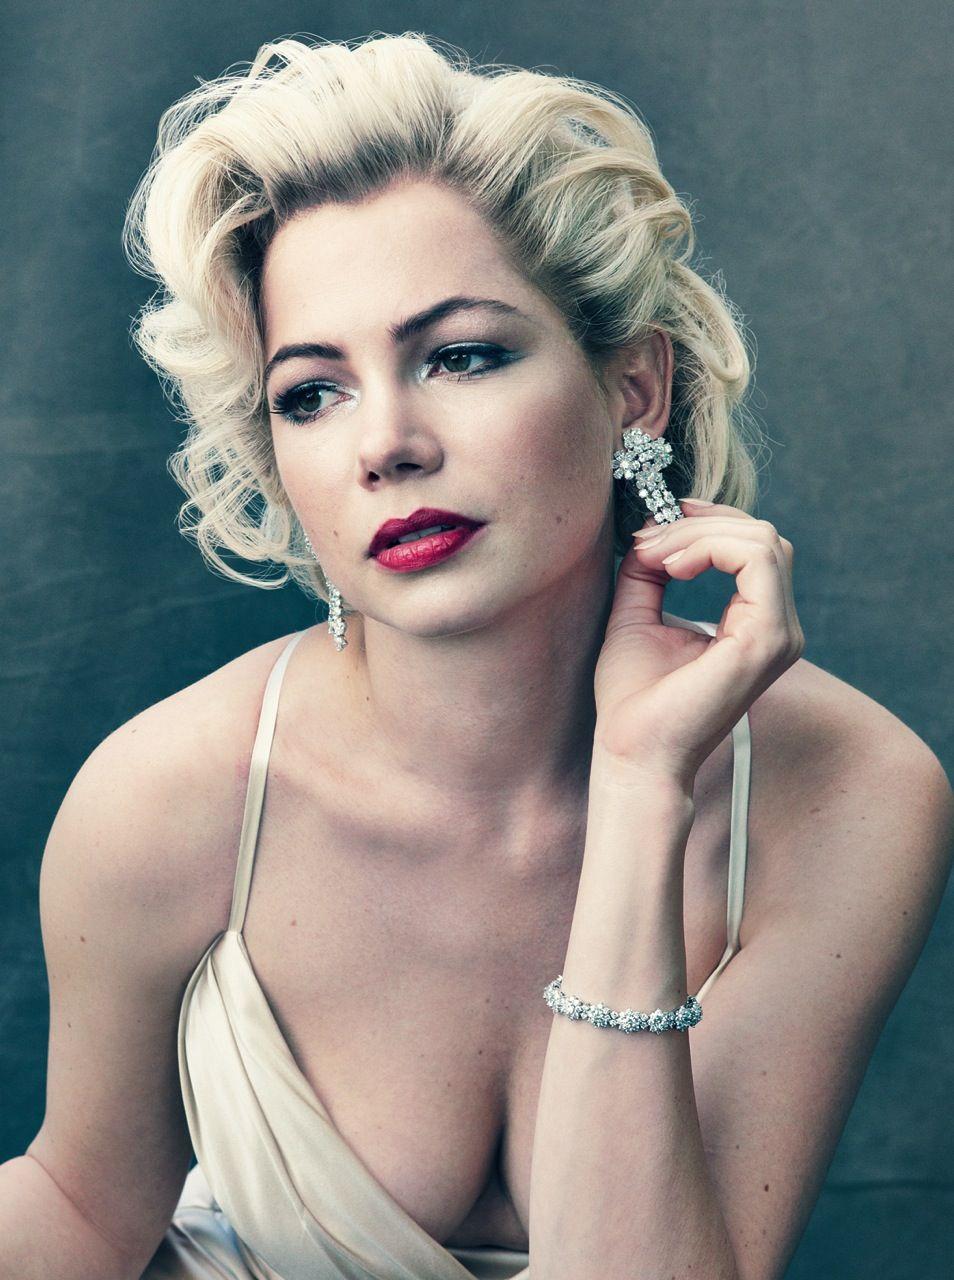 Michelle Williams as Marilyn Monroe 046d3468e